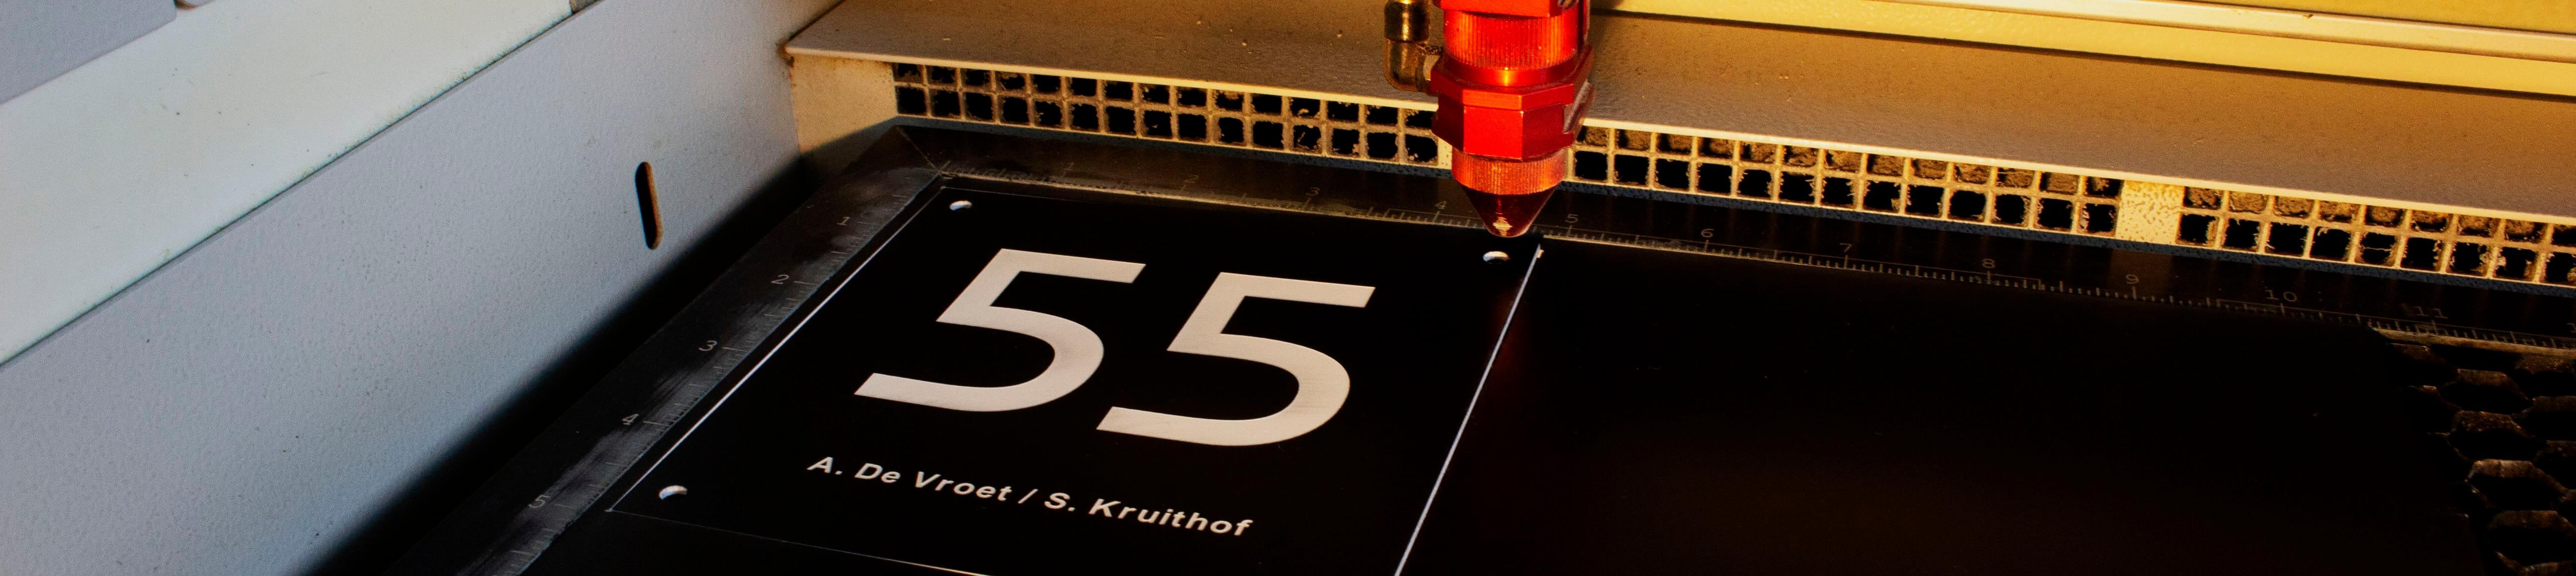 nummerbordjes maken